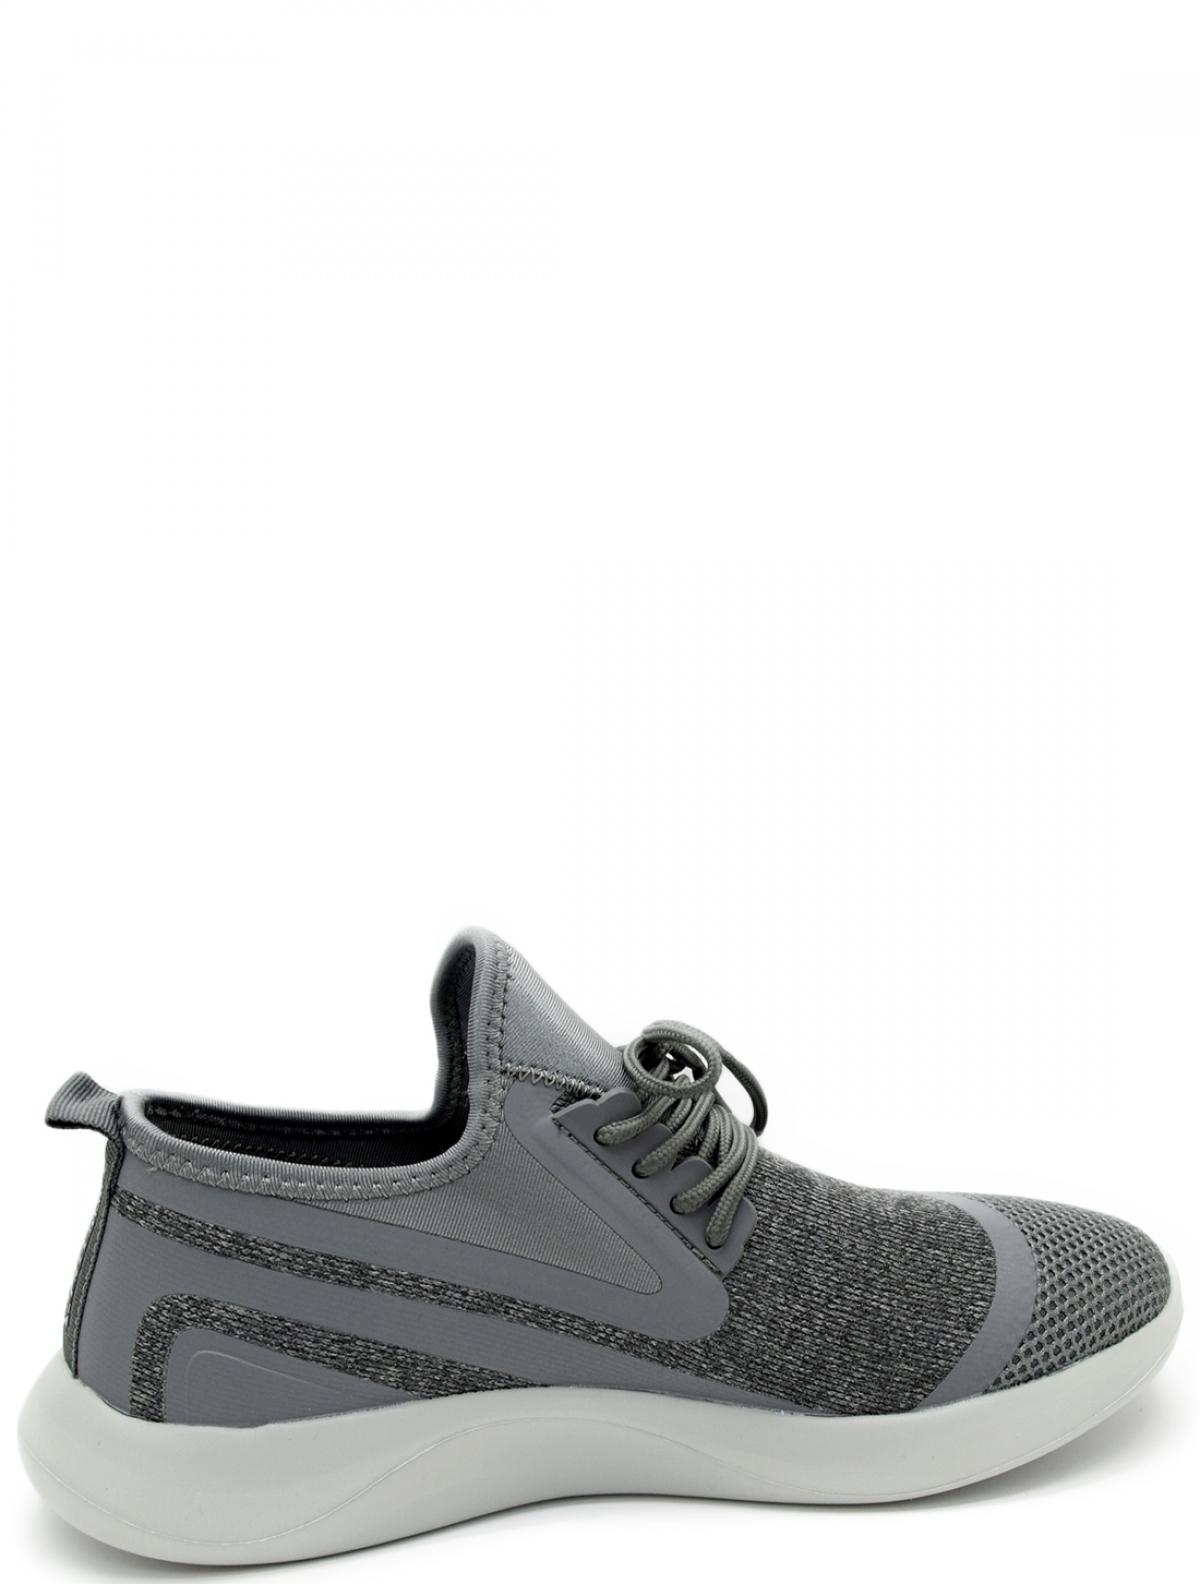 CROSBY 497028/01-02 мужские кроссовки